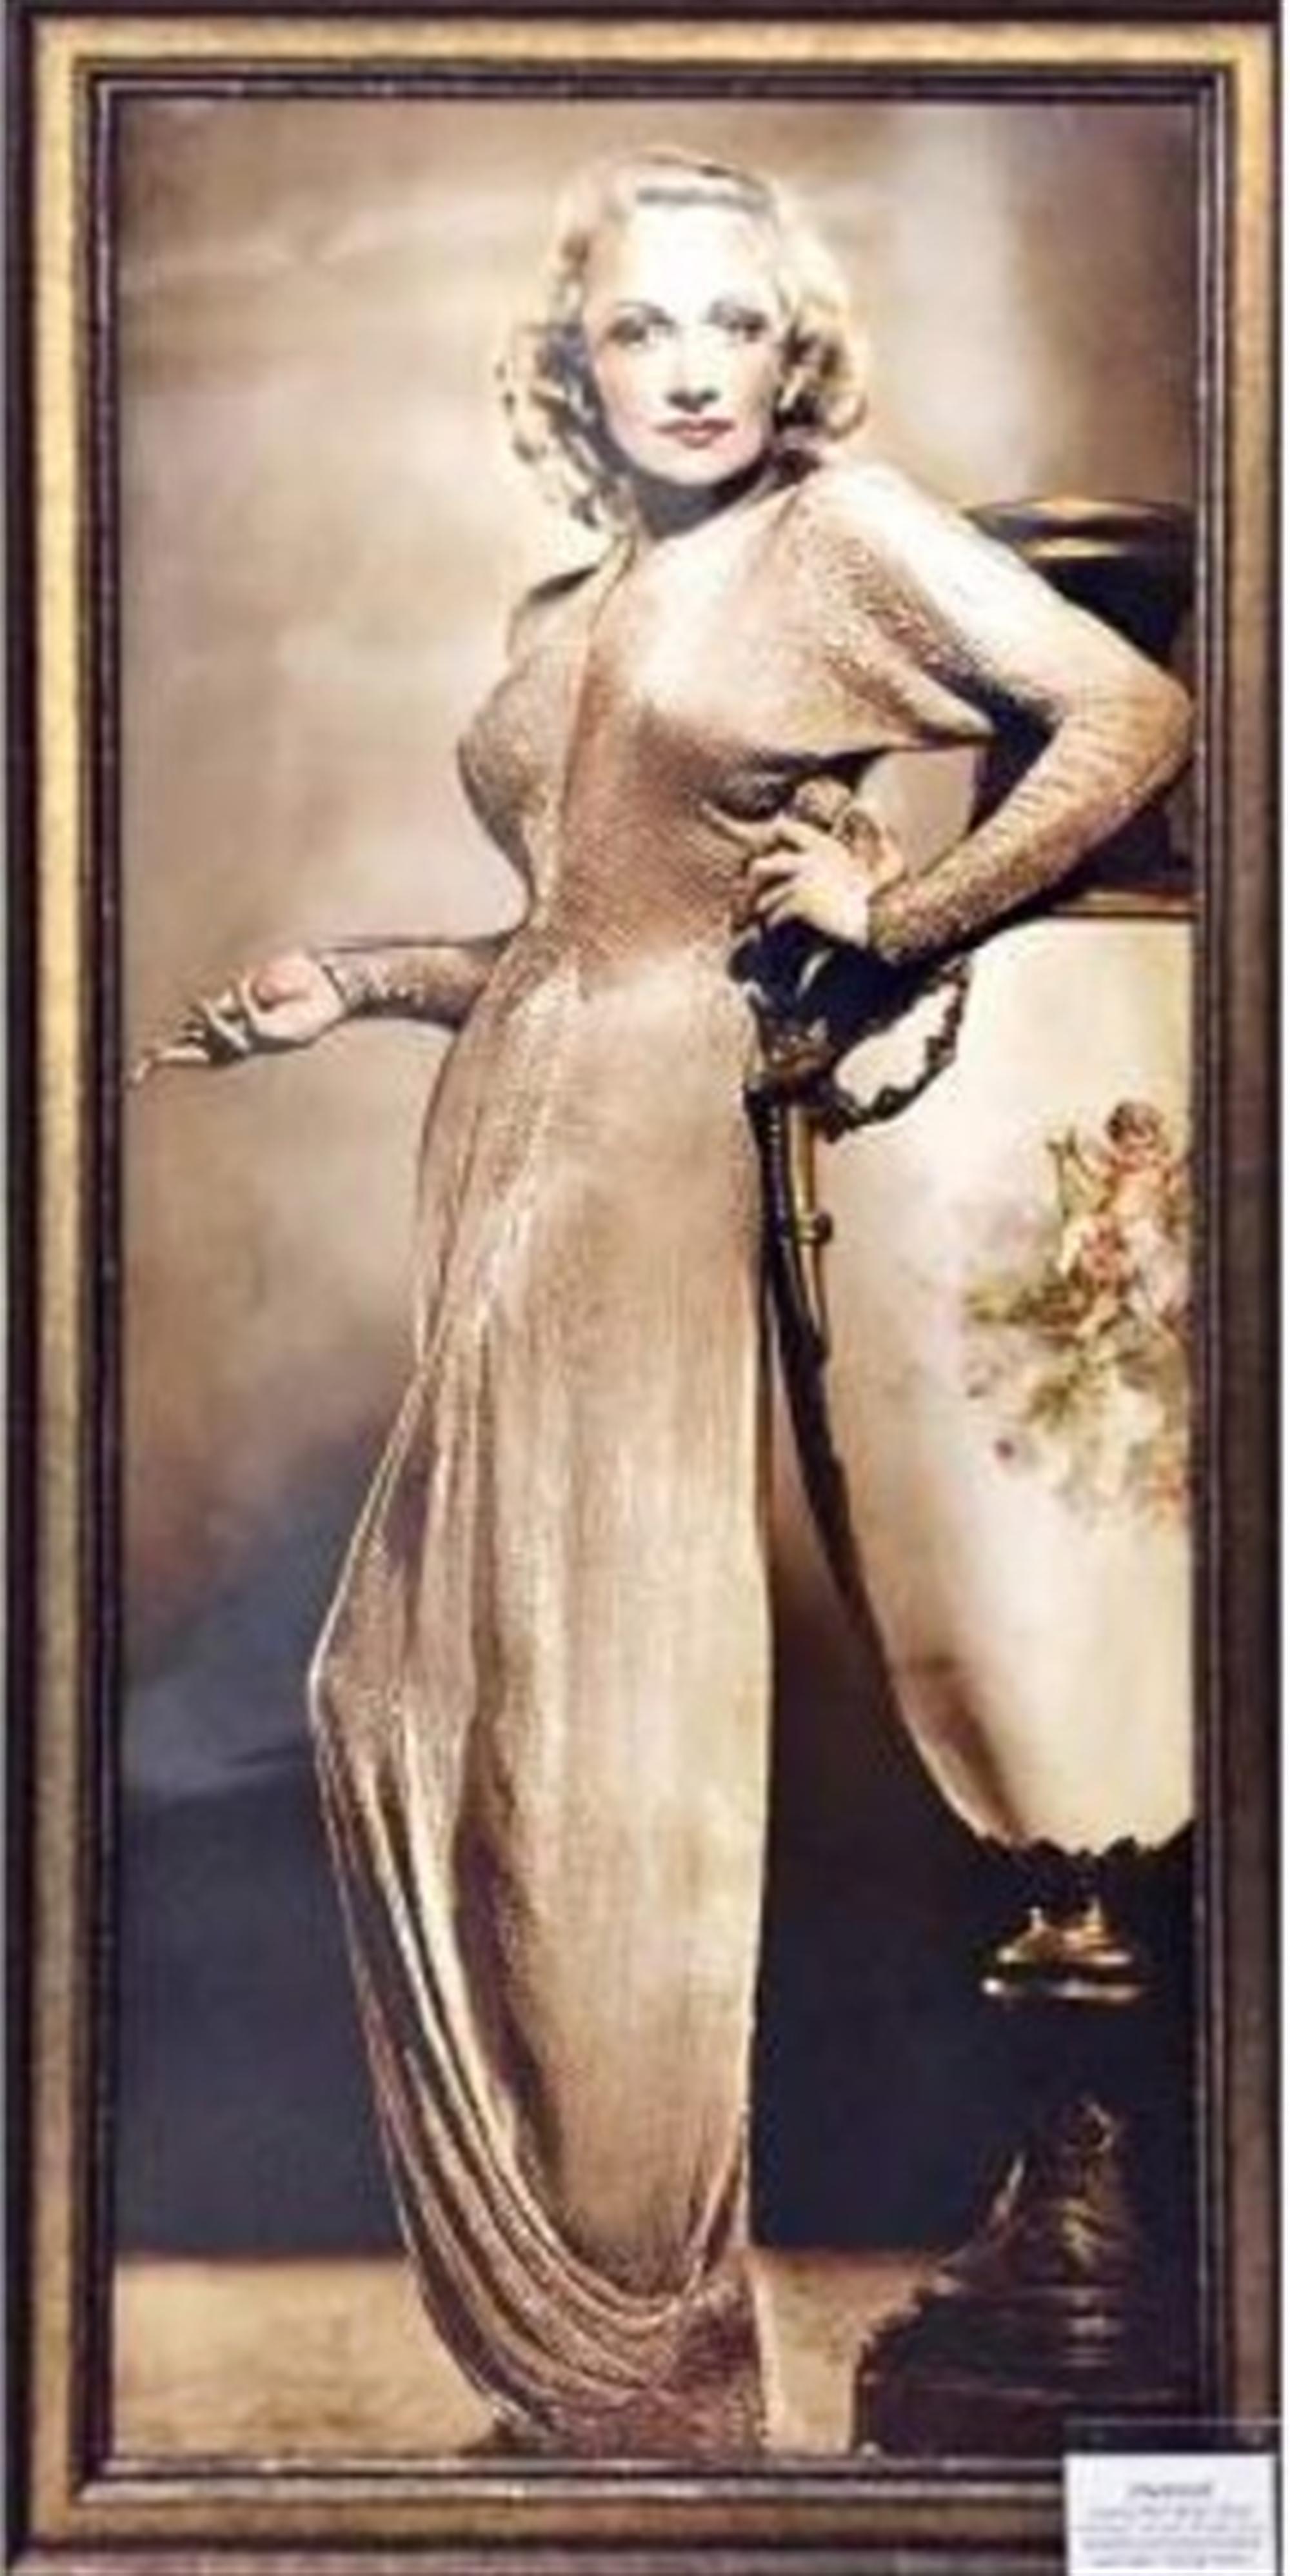 Dietrich by Bill Mack